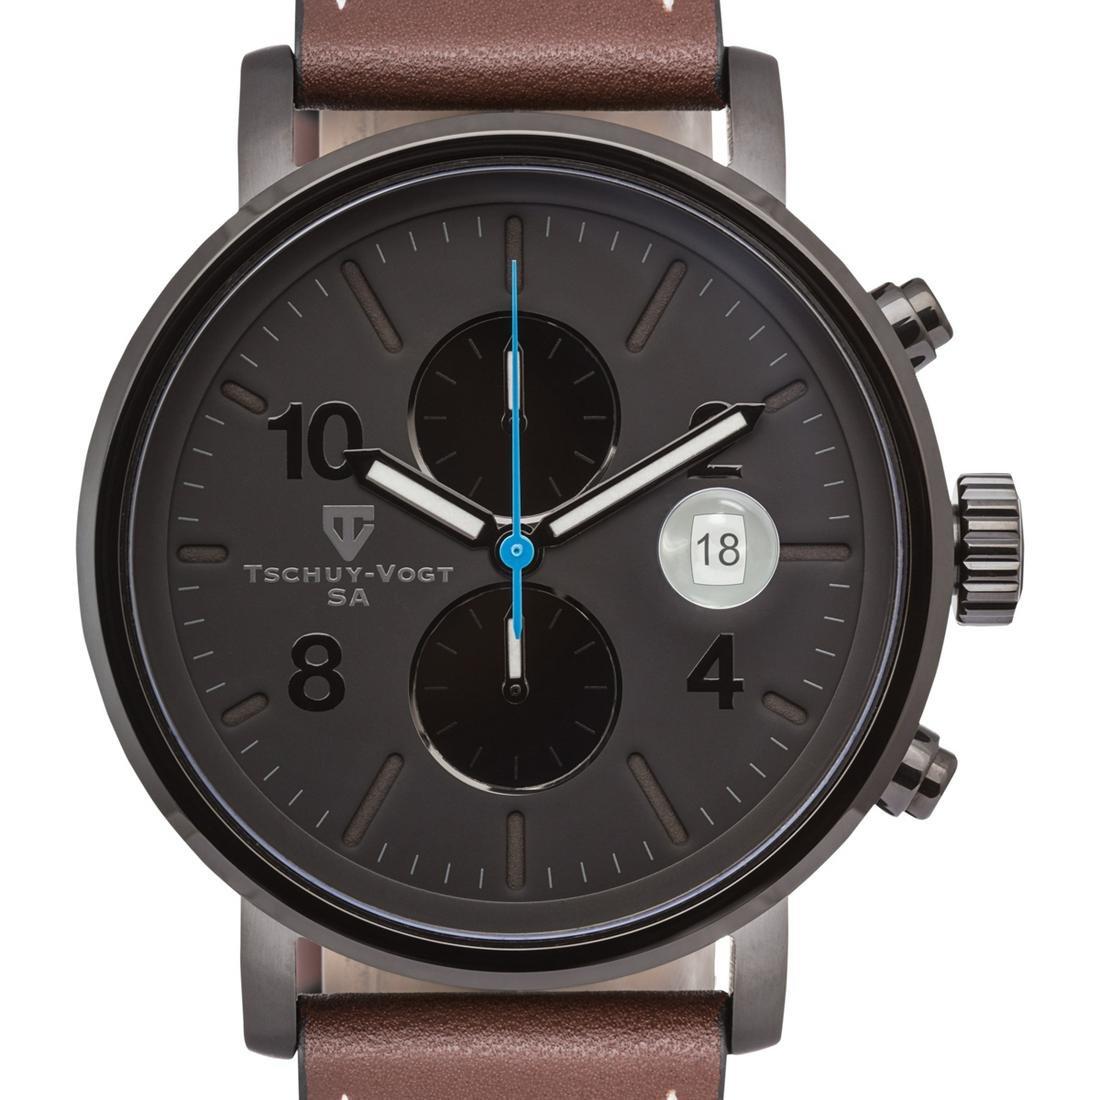 Tschuy-Vogt SA M60 Patton Chronograph Mens Watch